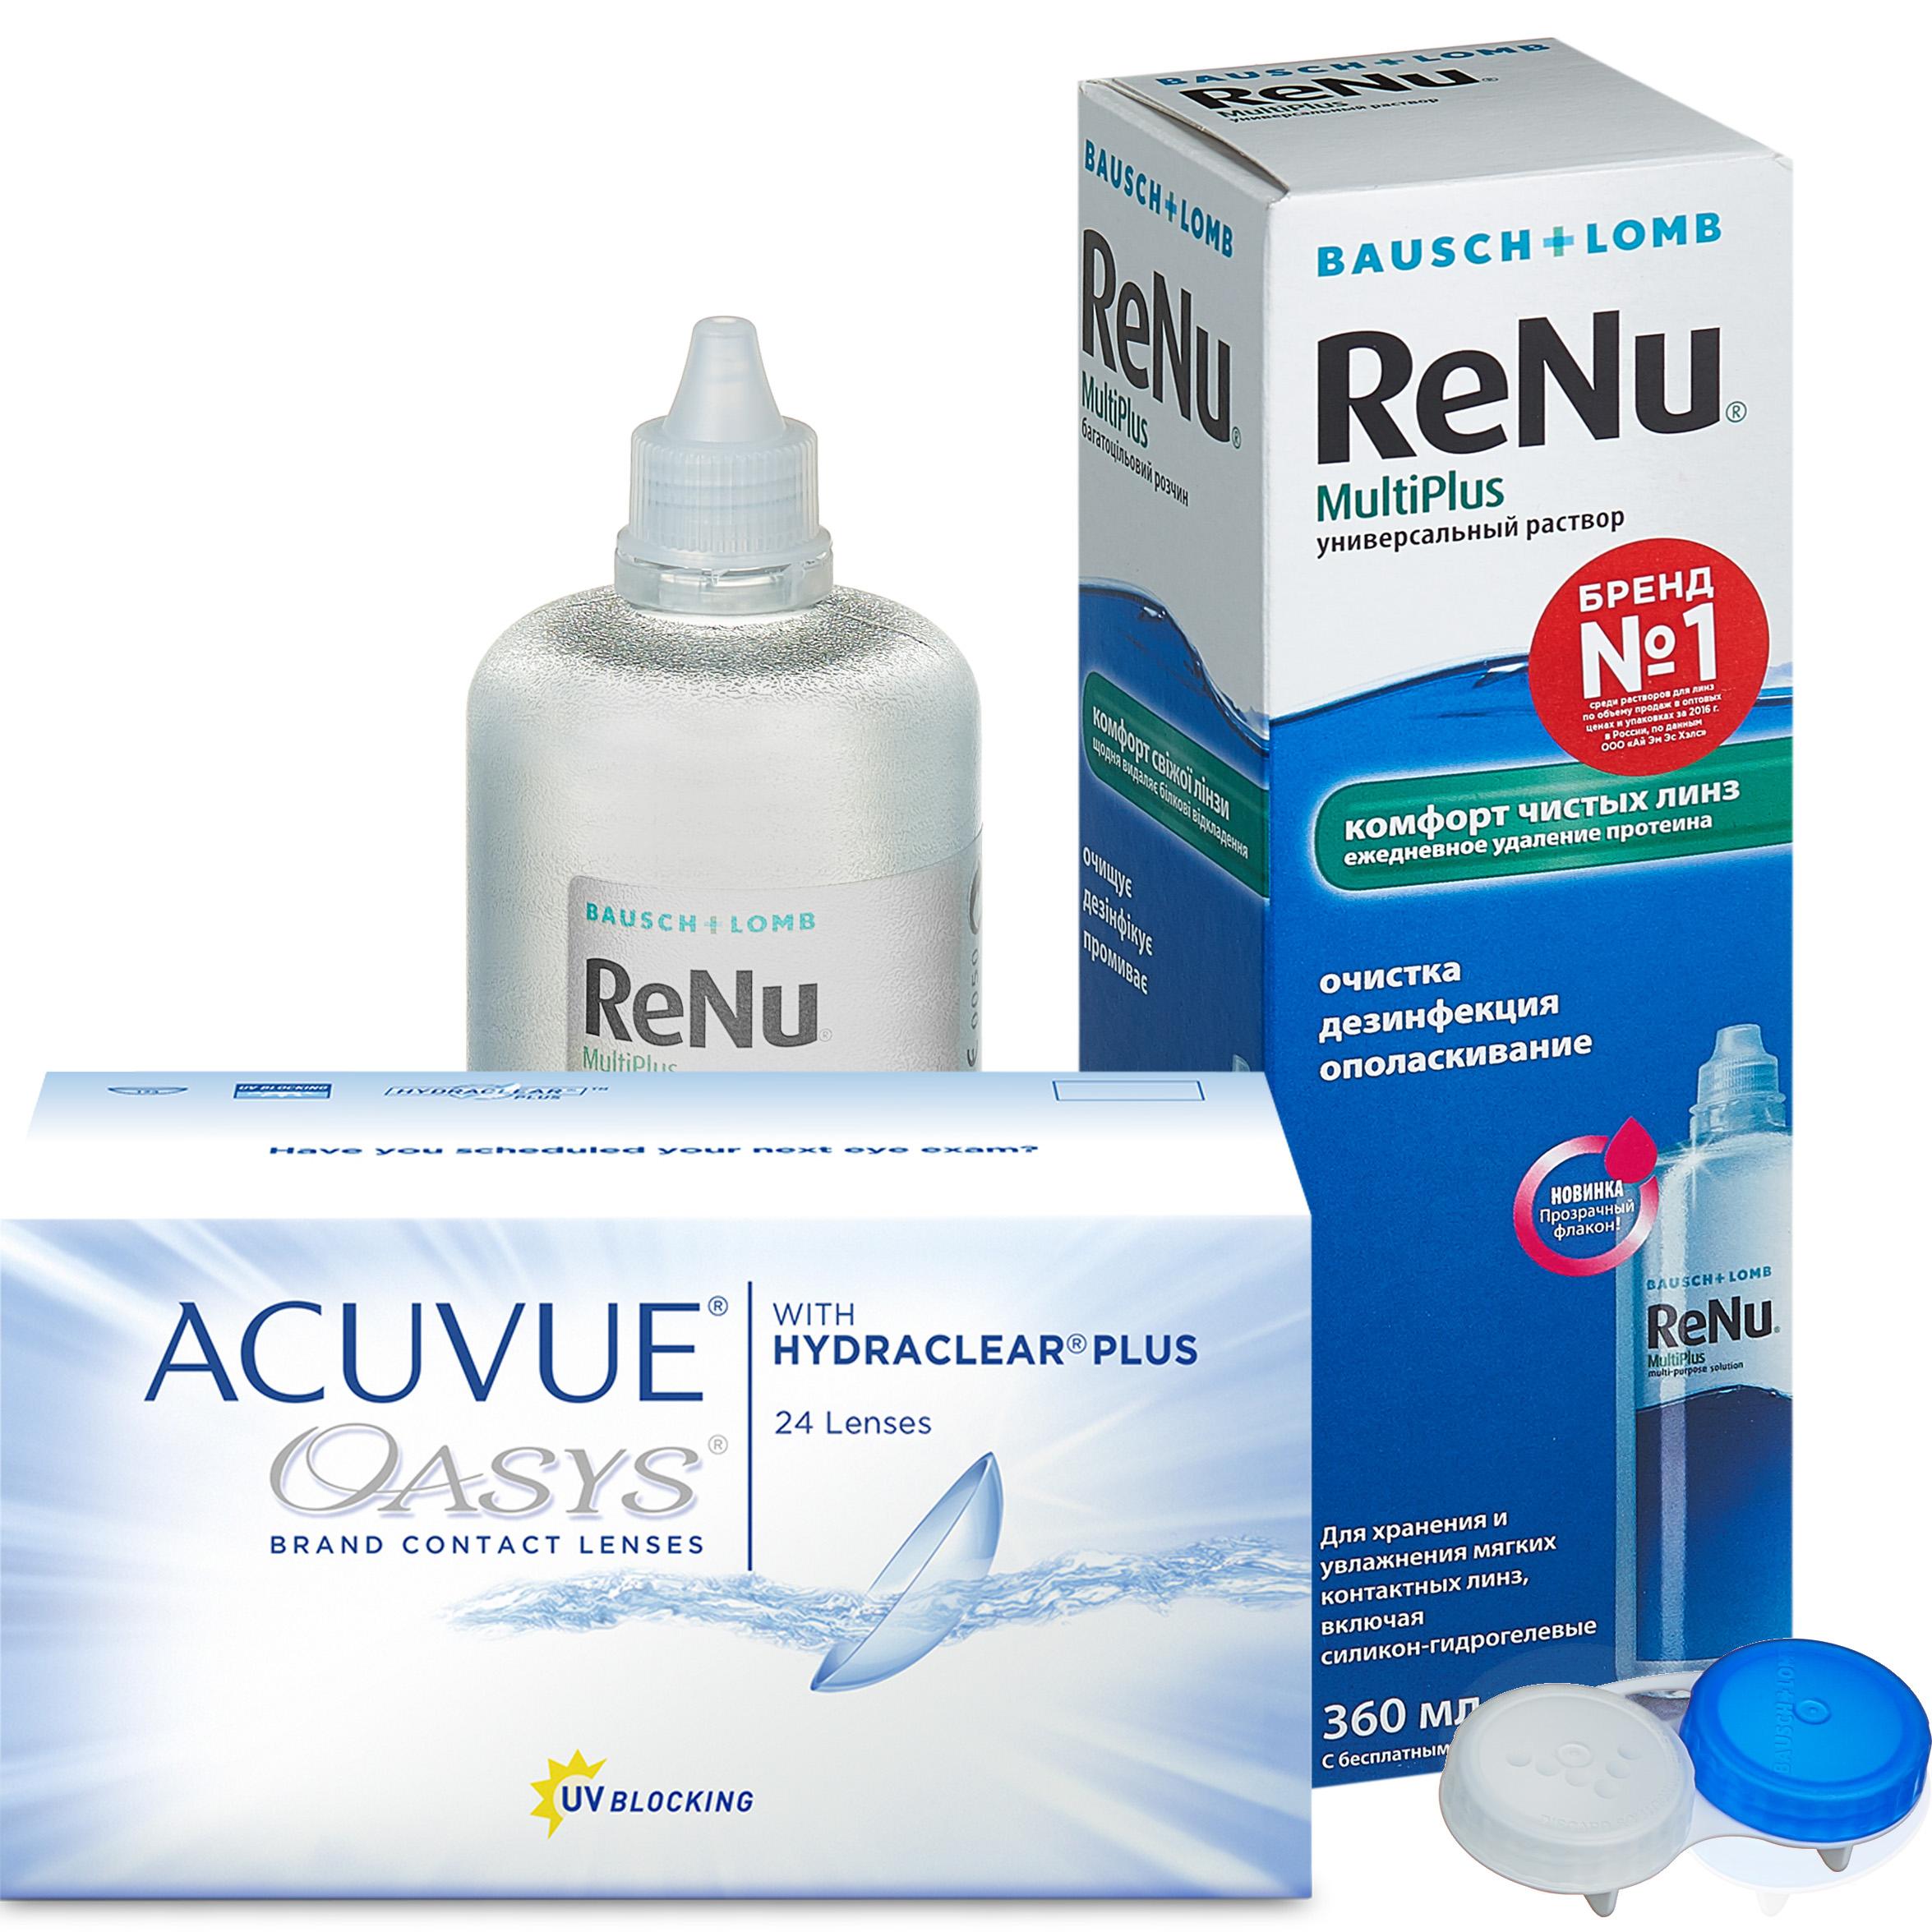 Купить Oasys with Hydraclear Plus 24 линзы + ReNu MultiPlus, Линзы Acuvue Oasys with Hydraclear Plus 24 линзы R 8.8 -6, 50 + ReNu Multi Plus 360 мл